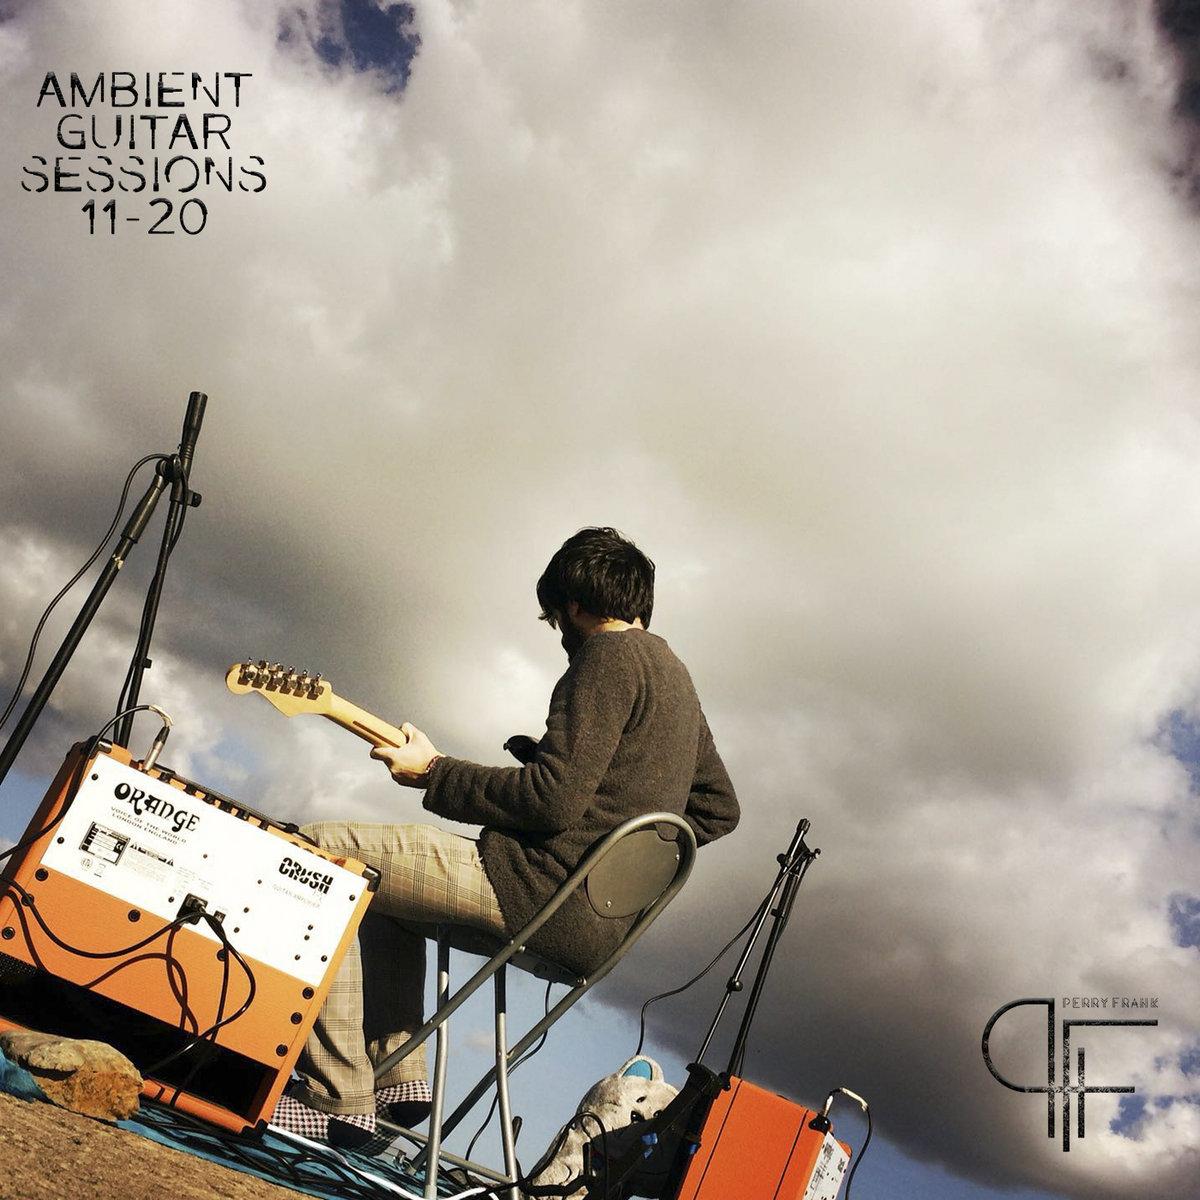 Perry Frank - Ambient Guitar Sessions - 11-20 - Francesco Perra - Bandcamp - player - 2019 - Sa Scena Sarda